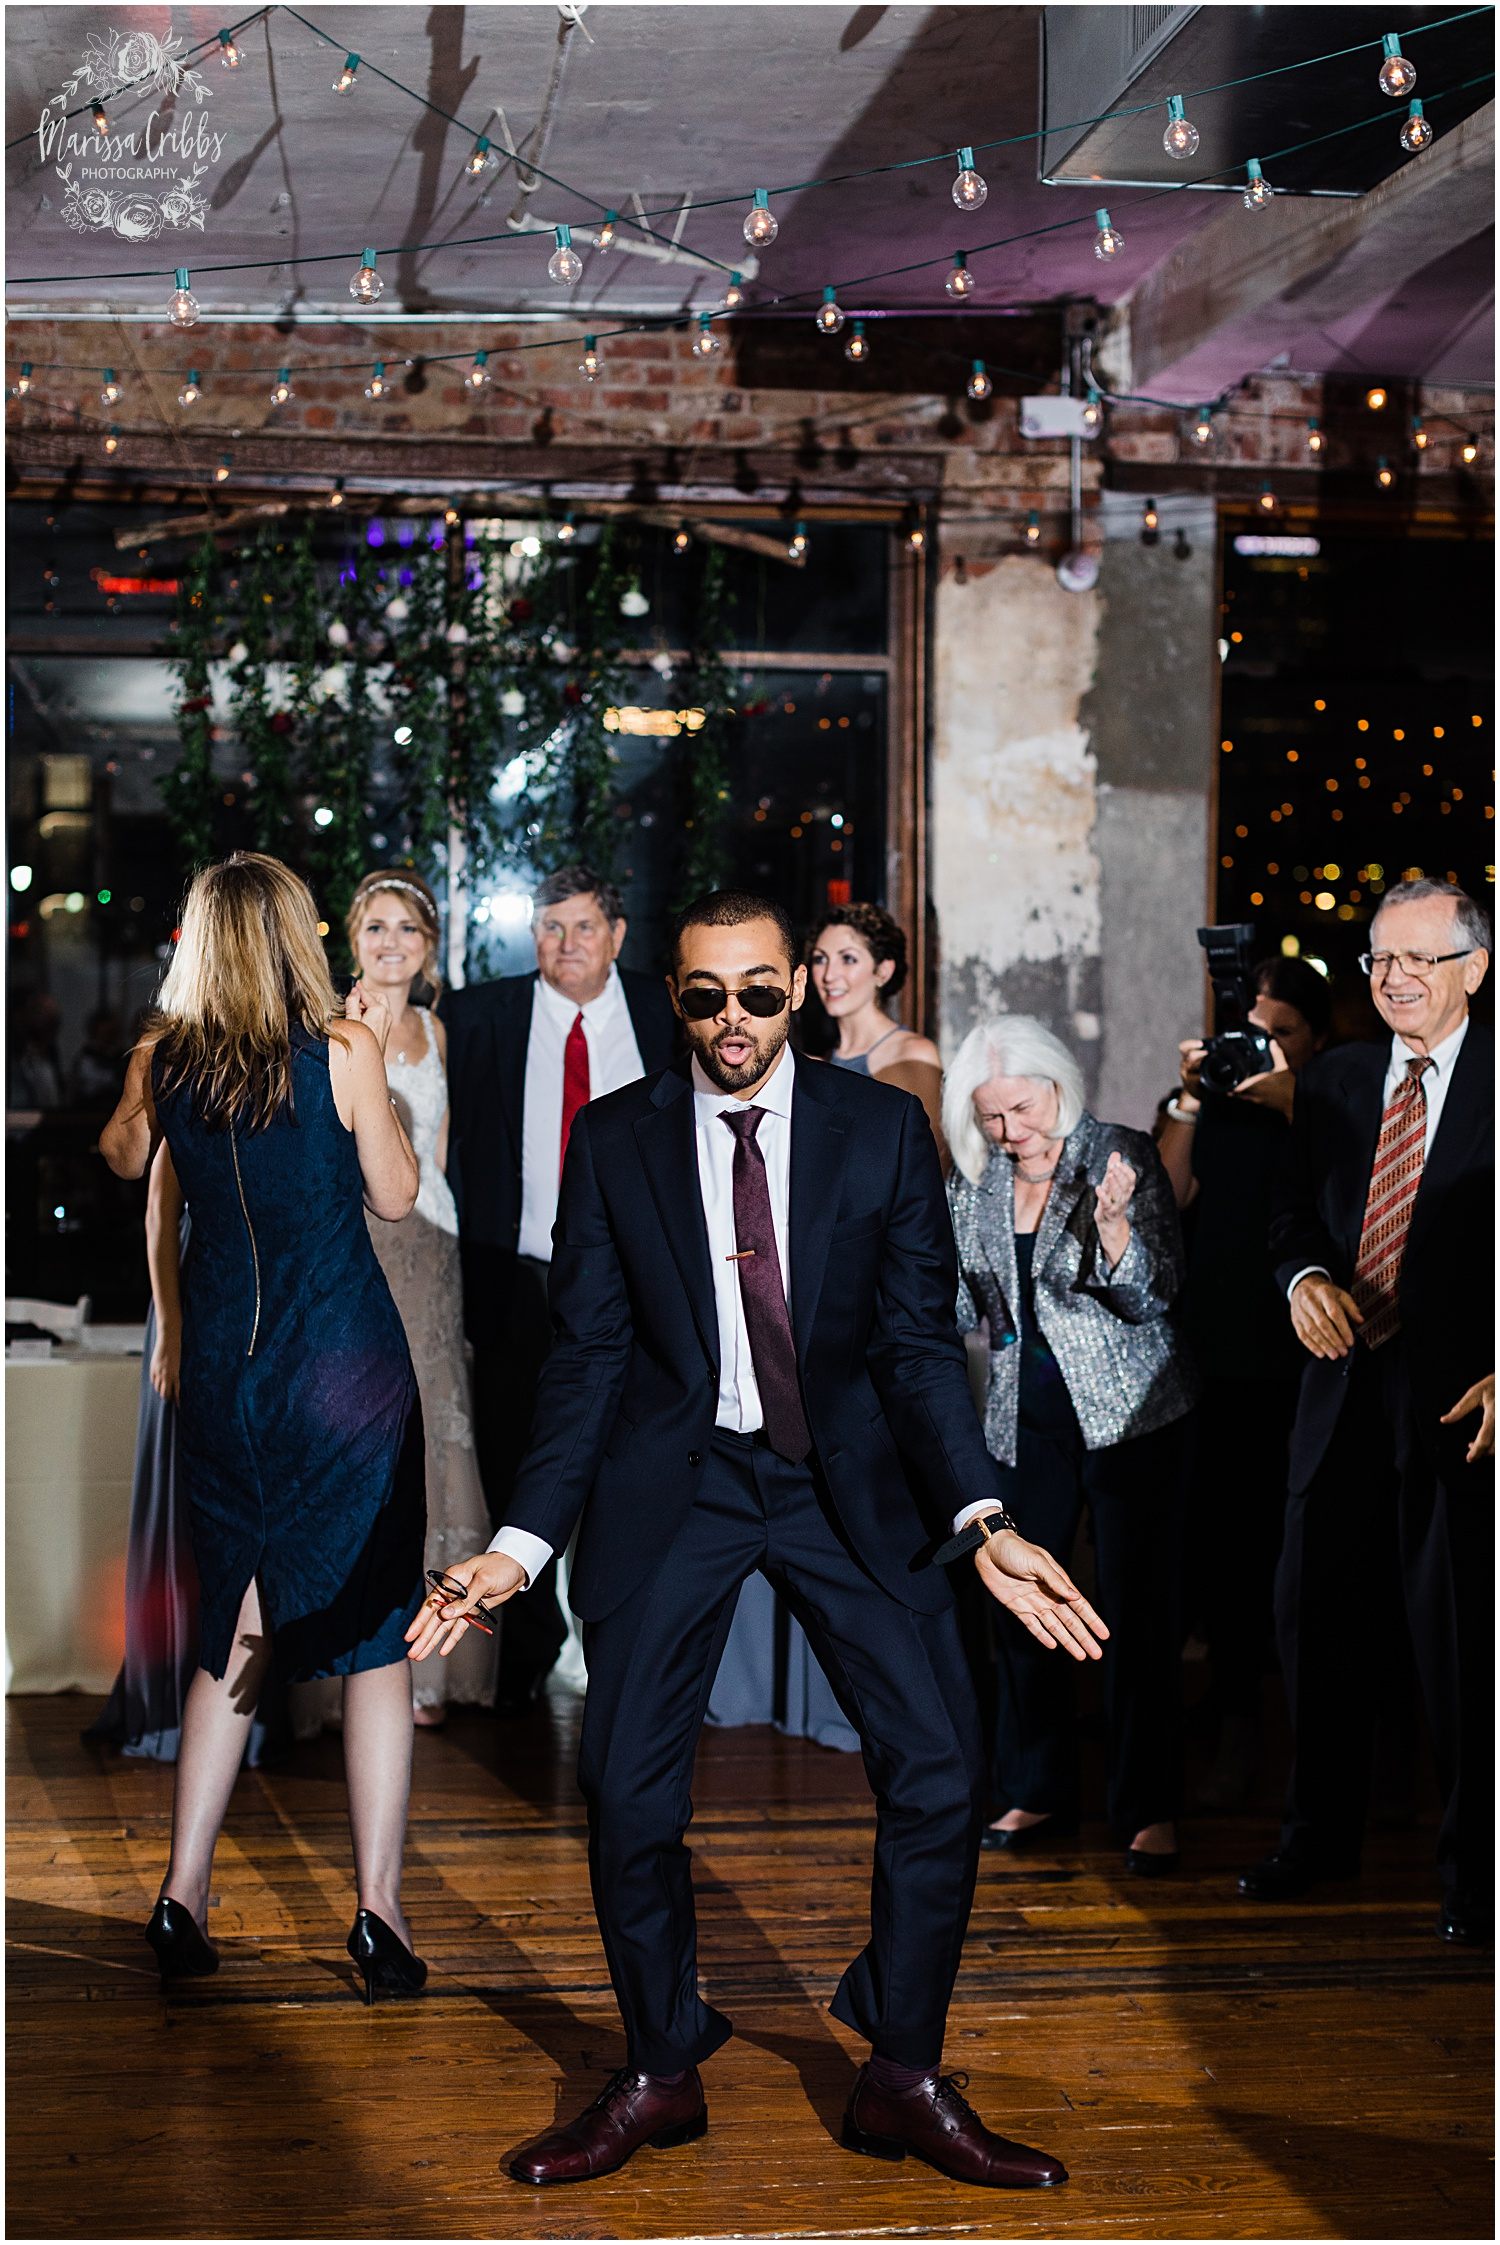 BAUER WEDDING   KELSEA & JUSTIN   MARISSA CRIBBS PHOTOGRAPHY_6611.jpg